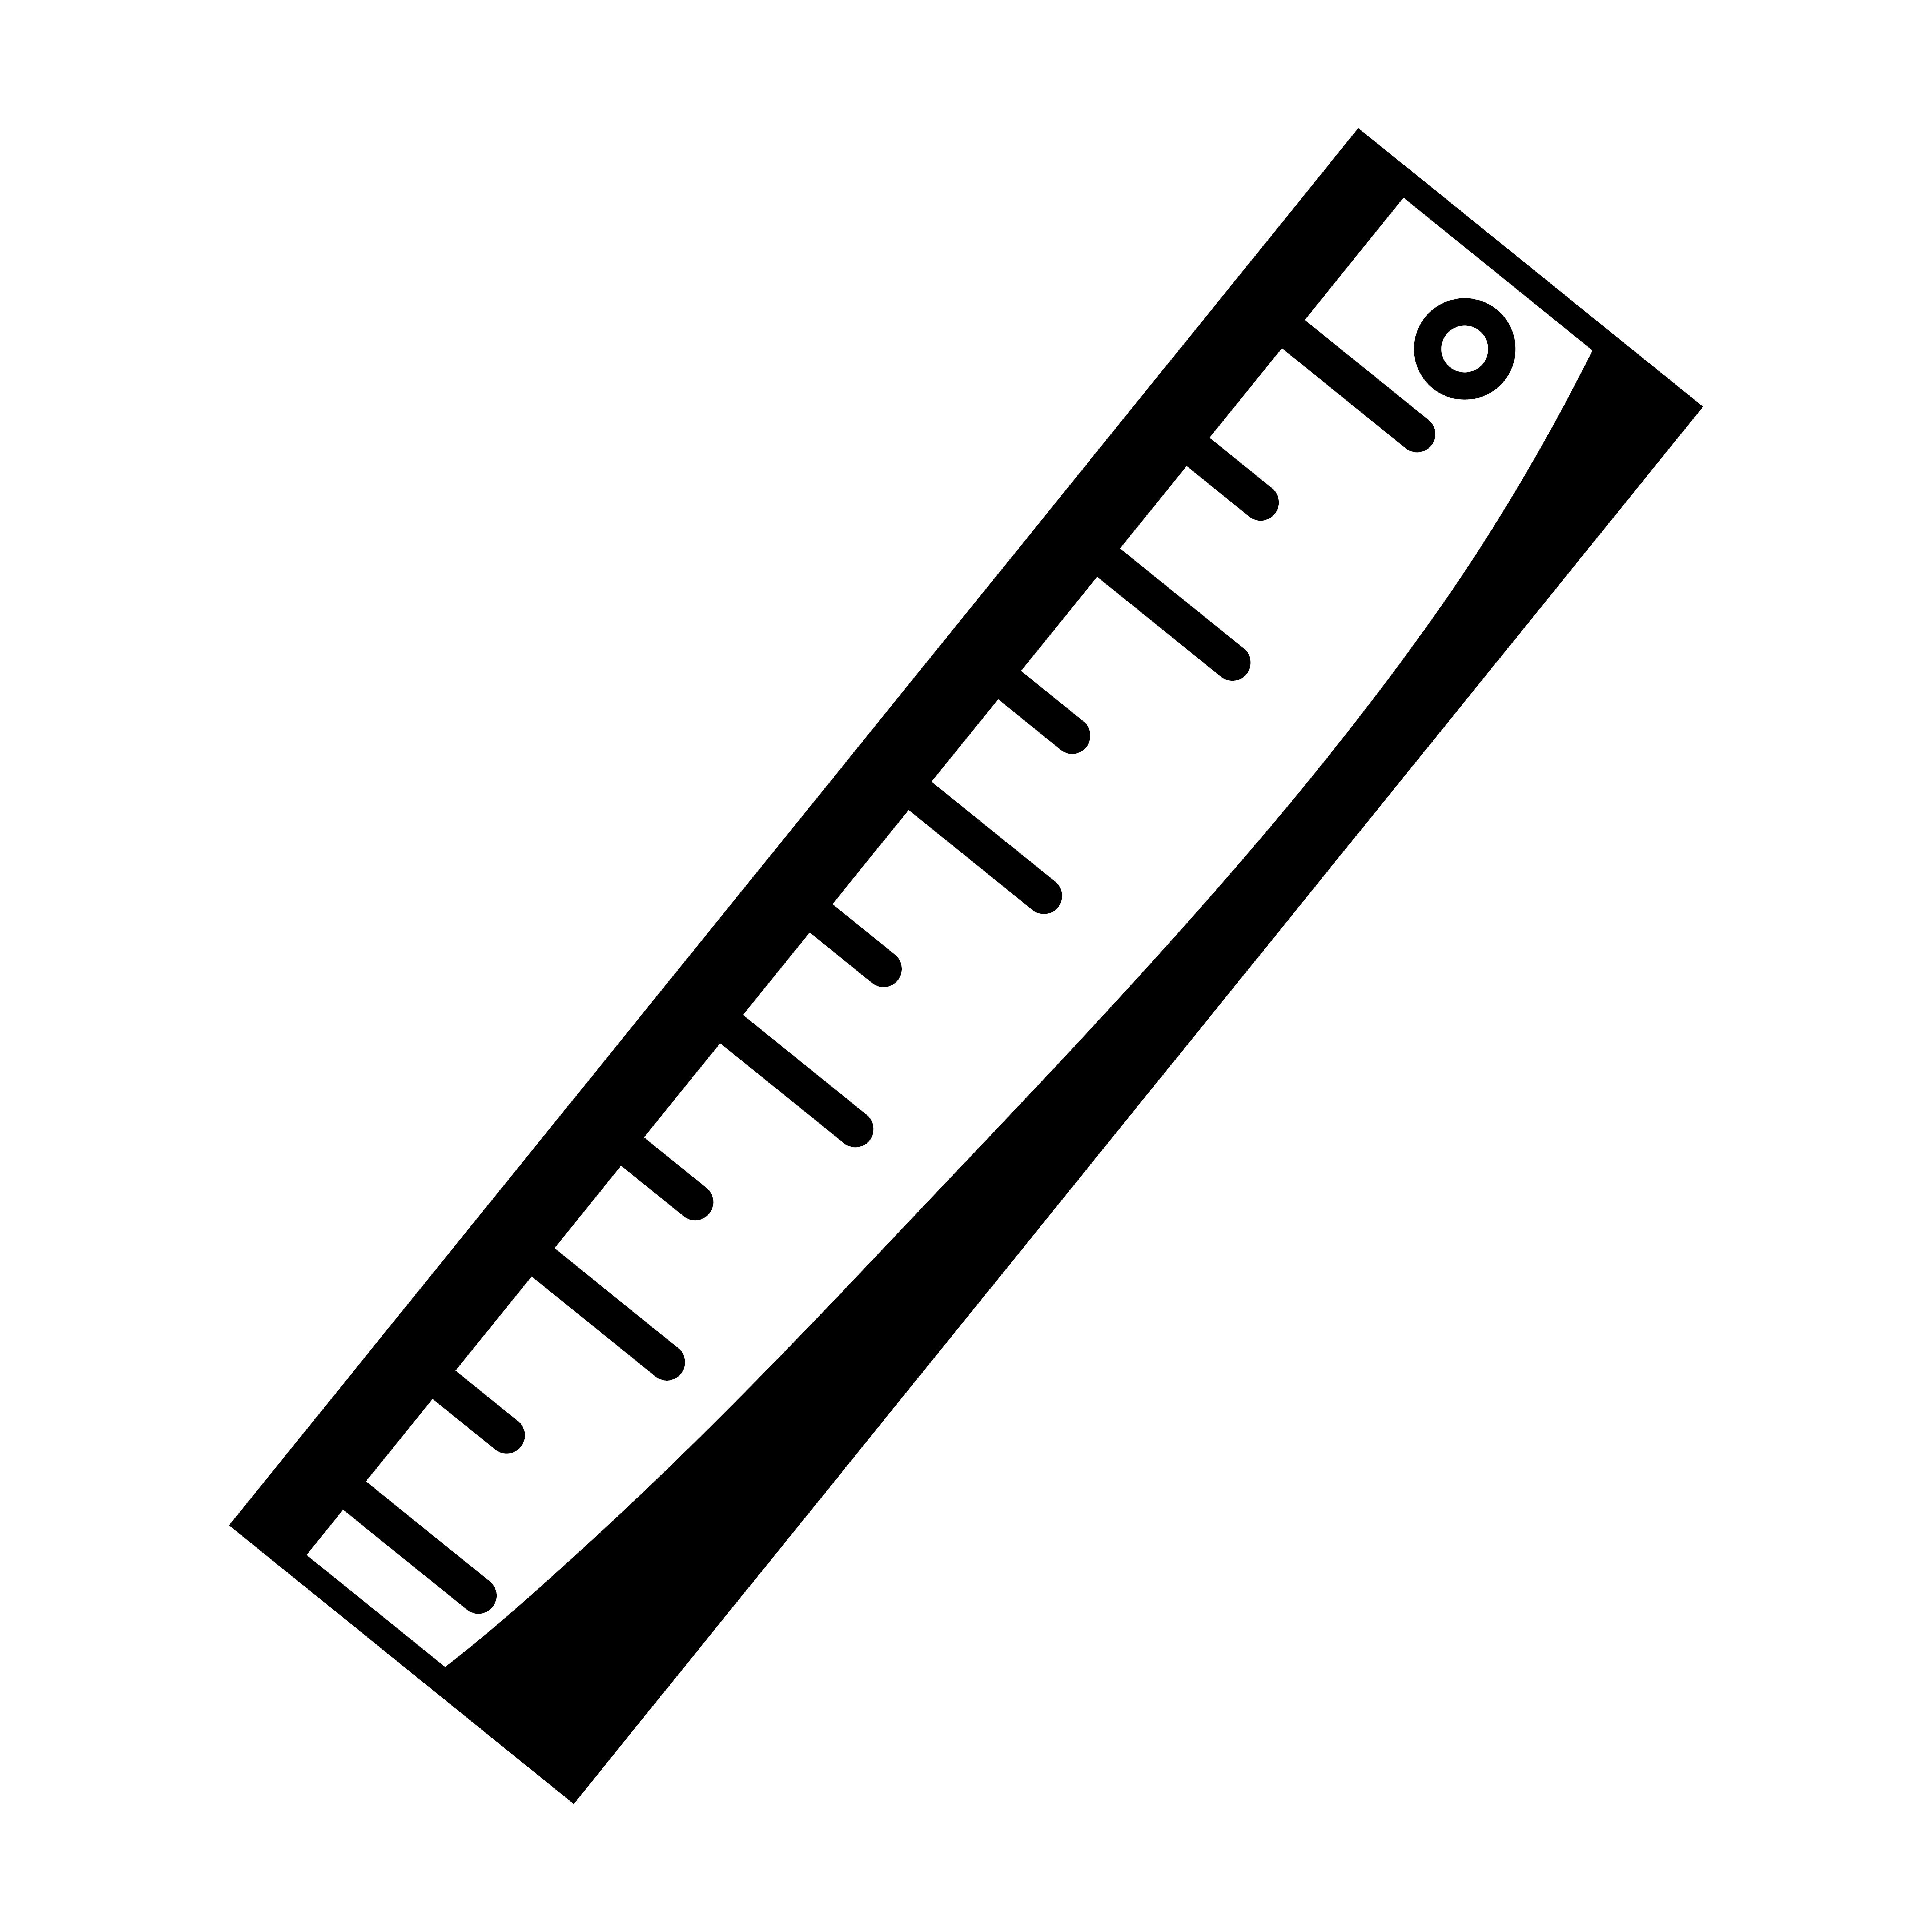 Contour Ruler Design To School Tool Education